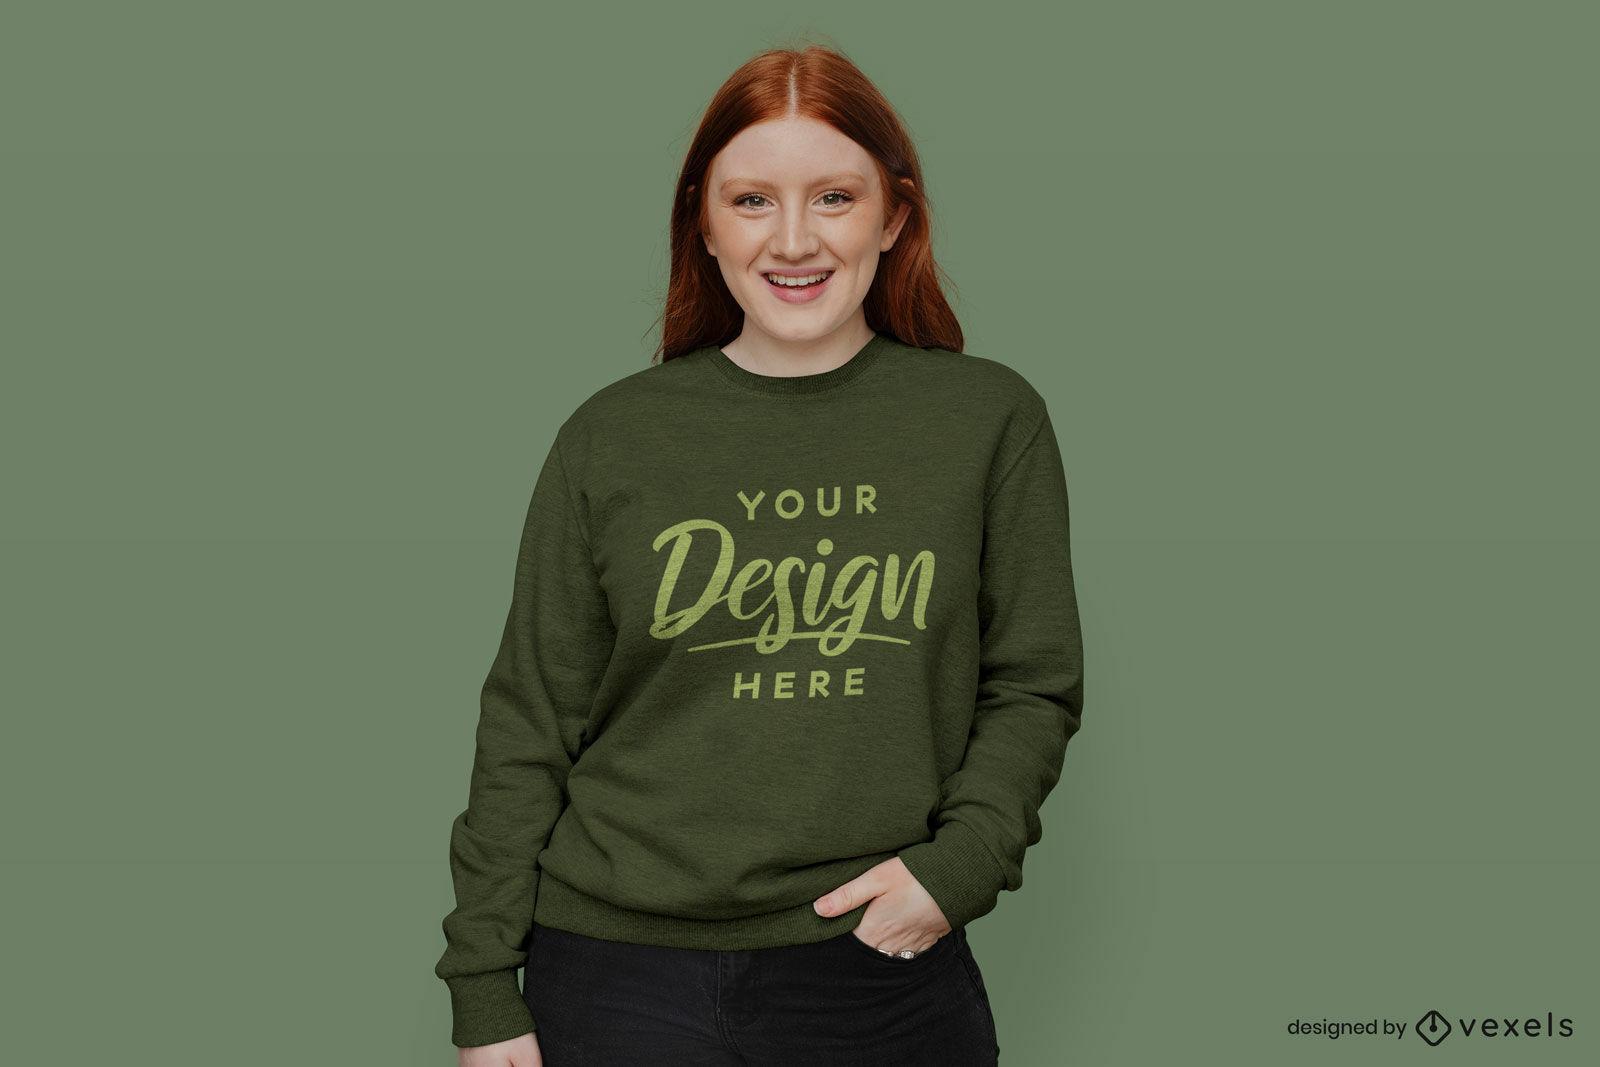 Ginger girl wearing green sweatshirt mockup